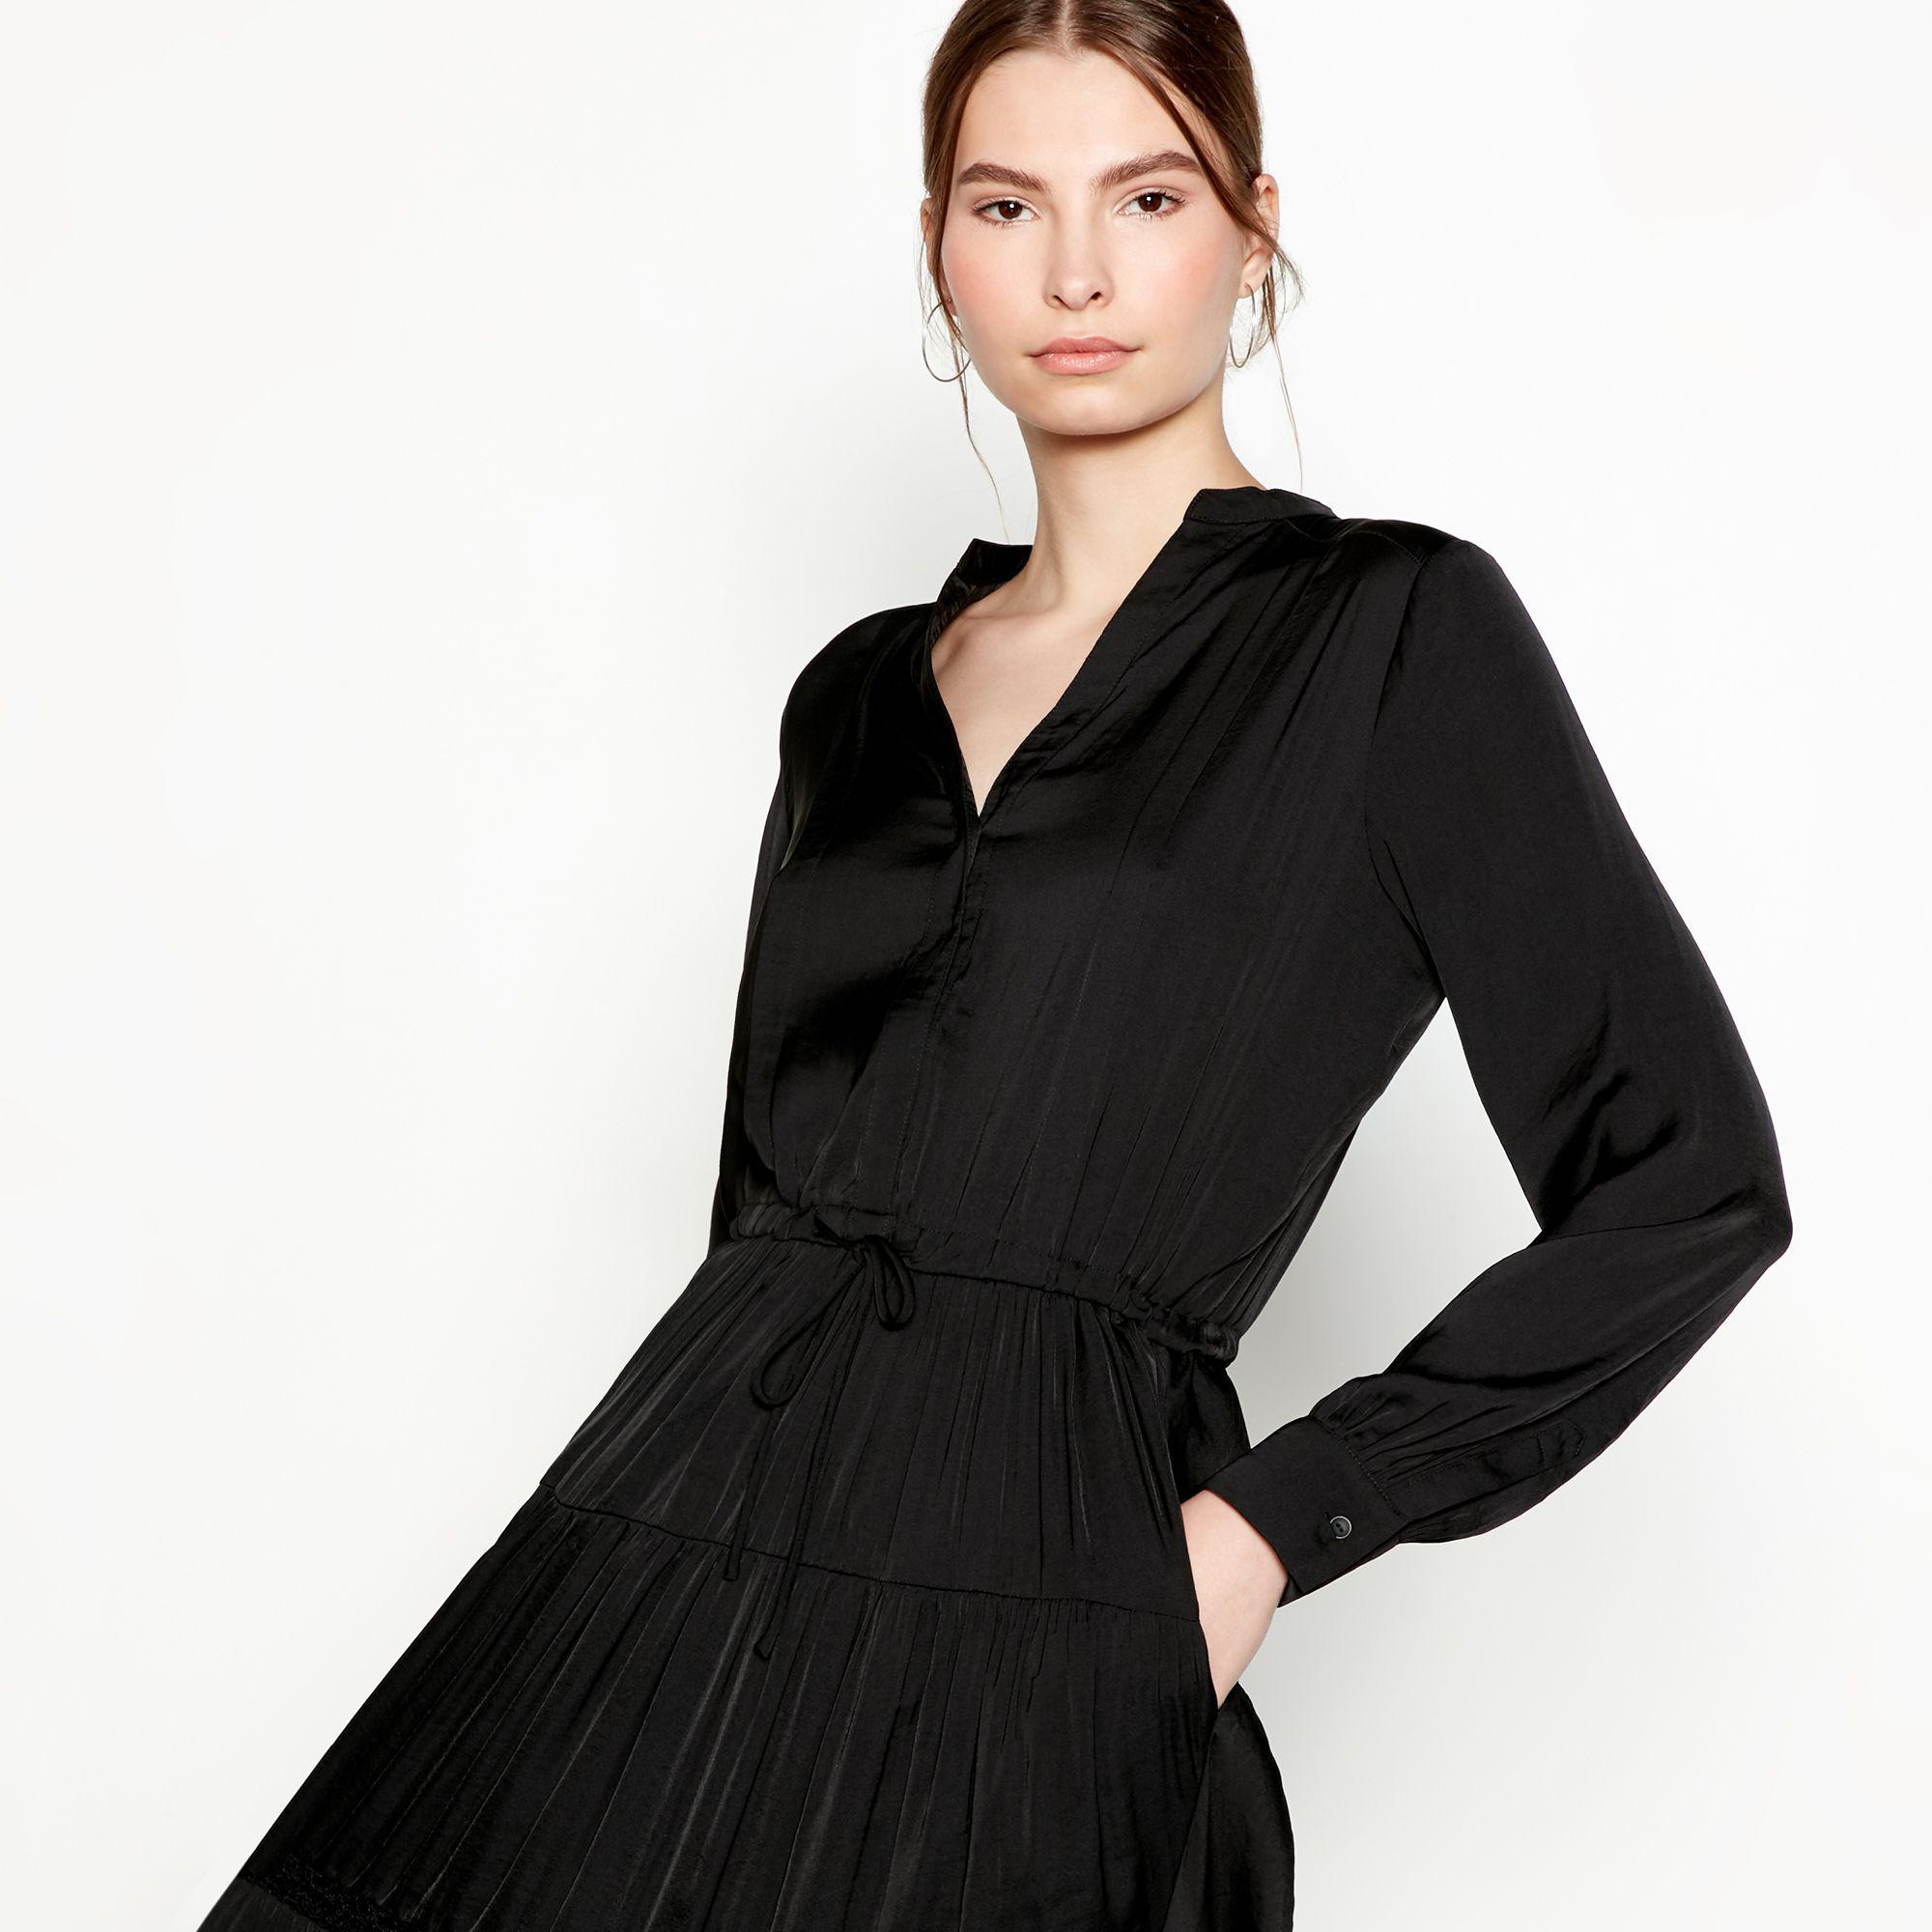 Six Ames Black Satin 'sofia' V-neck Long Sleeve Full Length Fit And Flare Dress